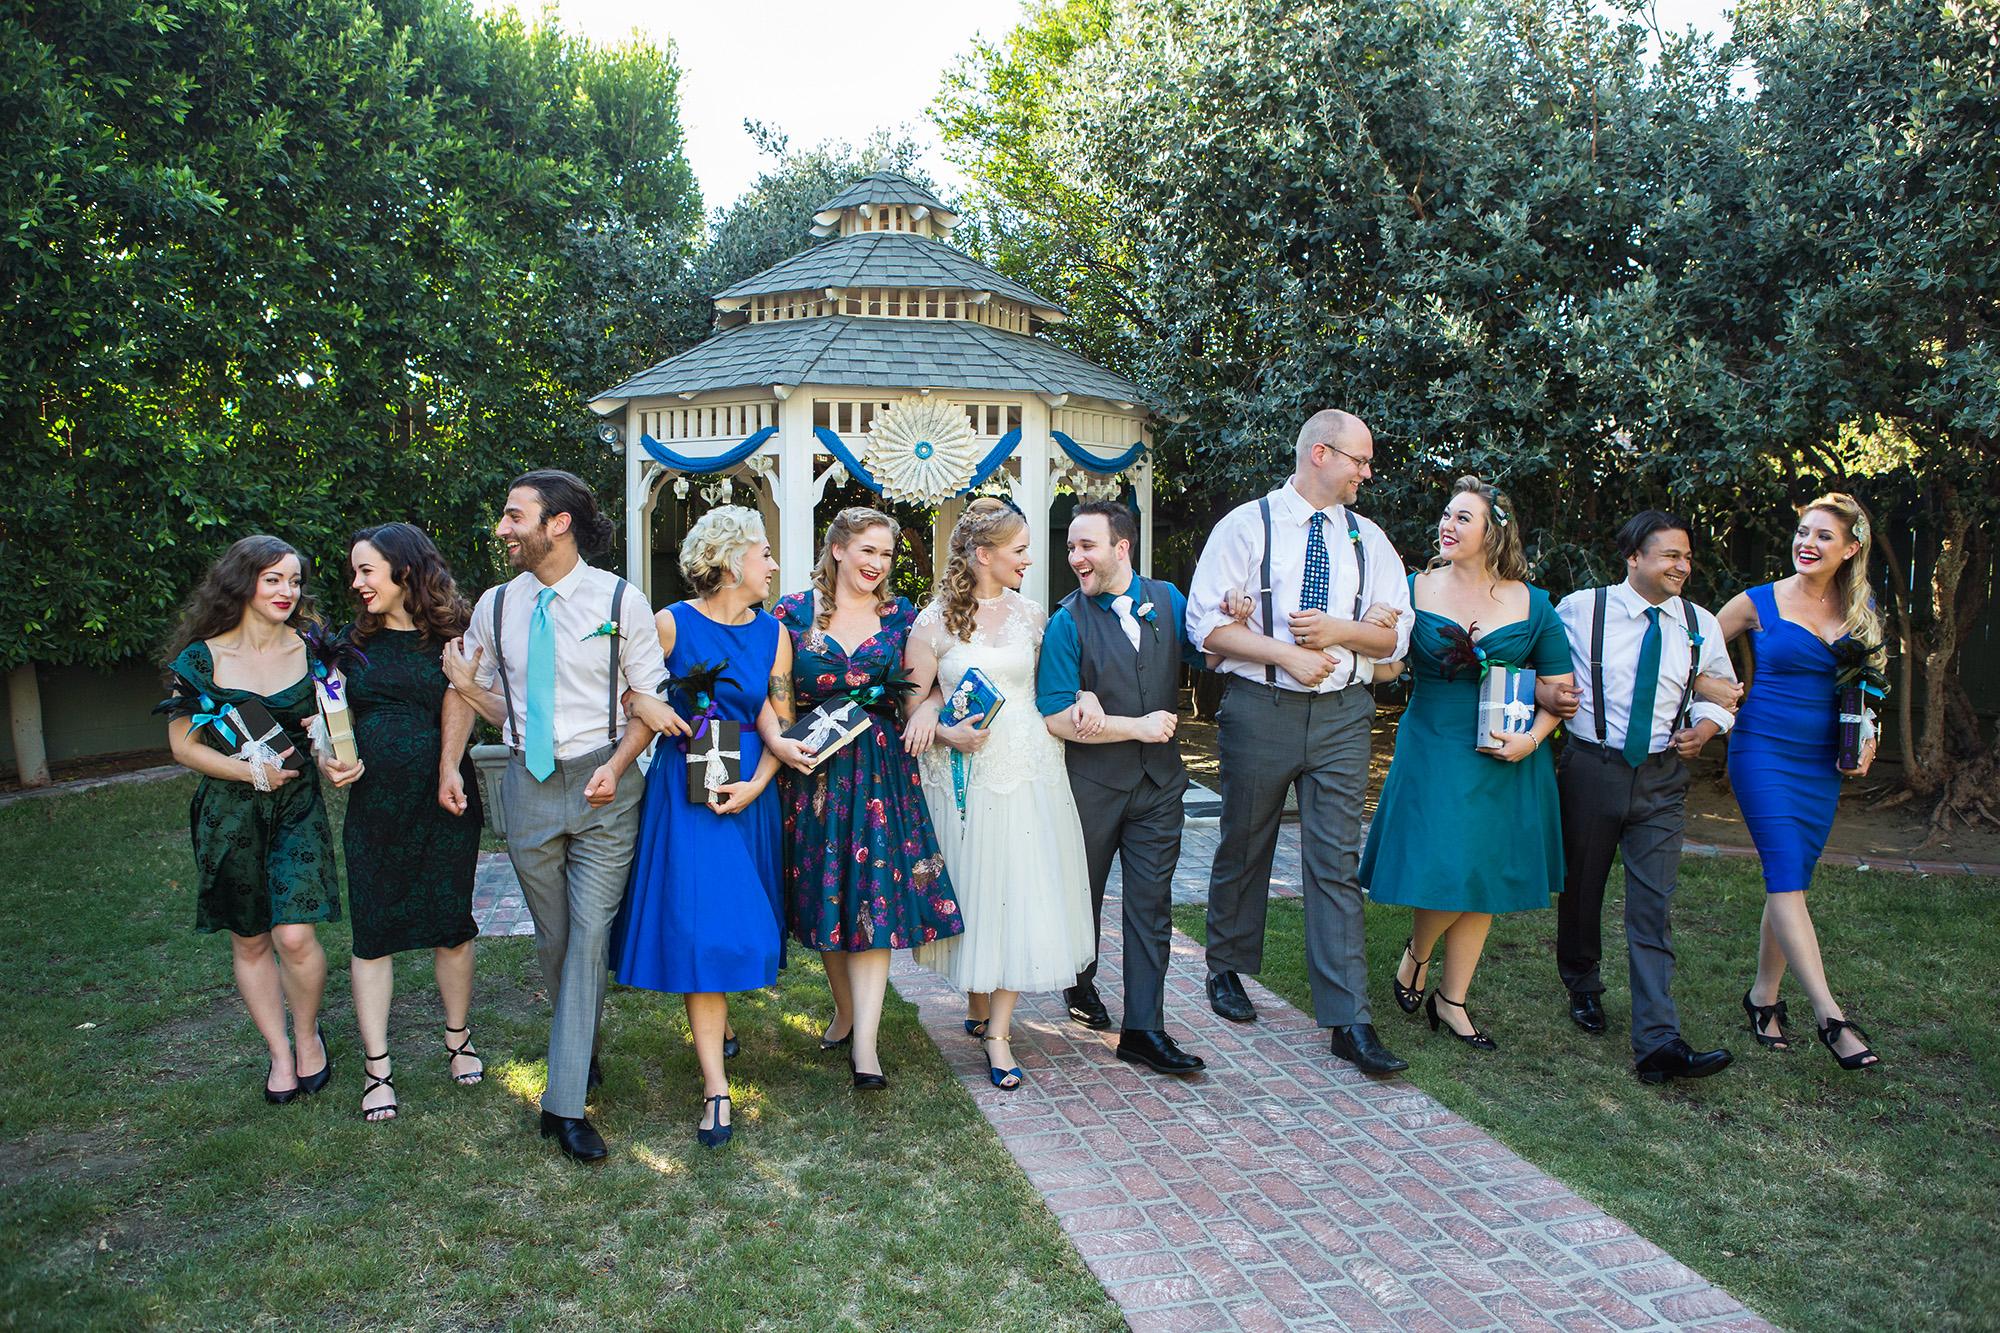 christmas-house-weddings-receptions-carrie-vines-300.jpg